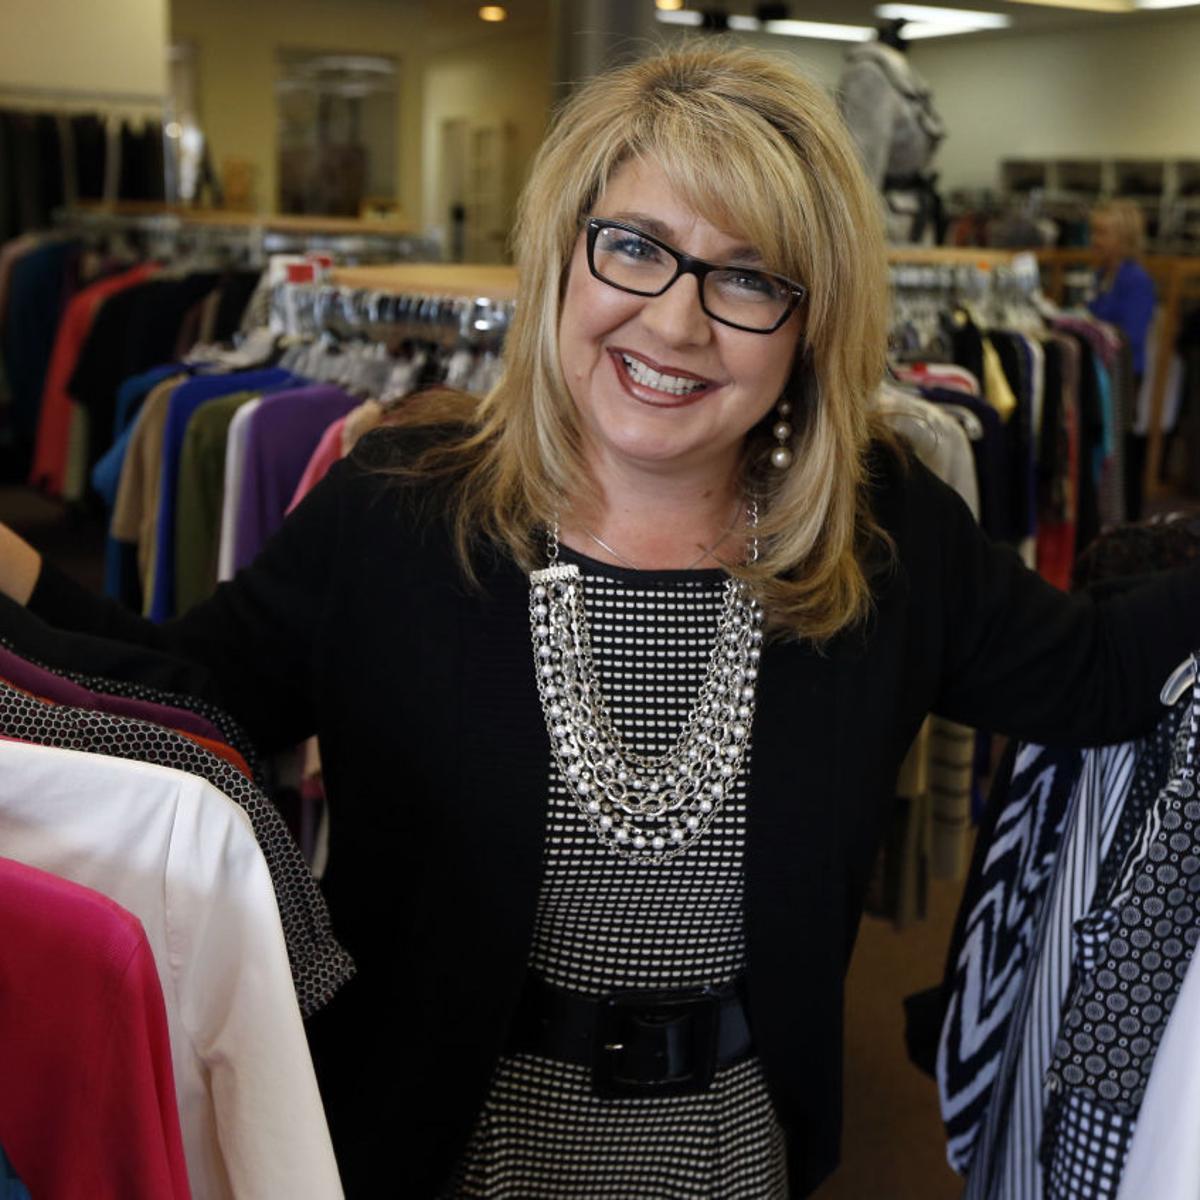 Dress for Success Tulsa: Celebrating 5 years of empowering women